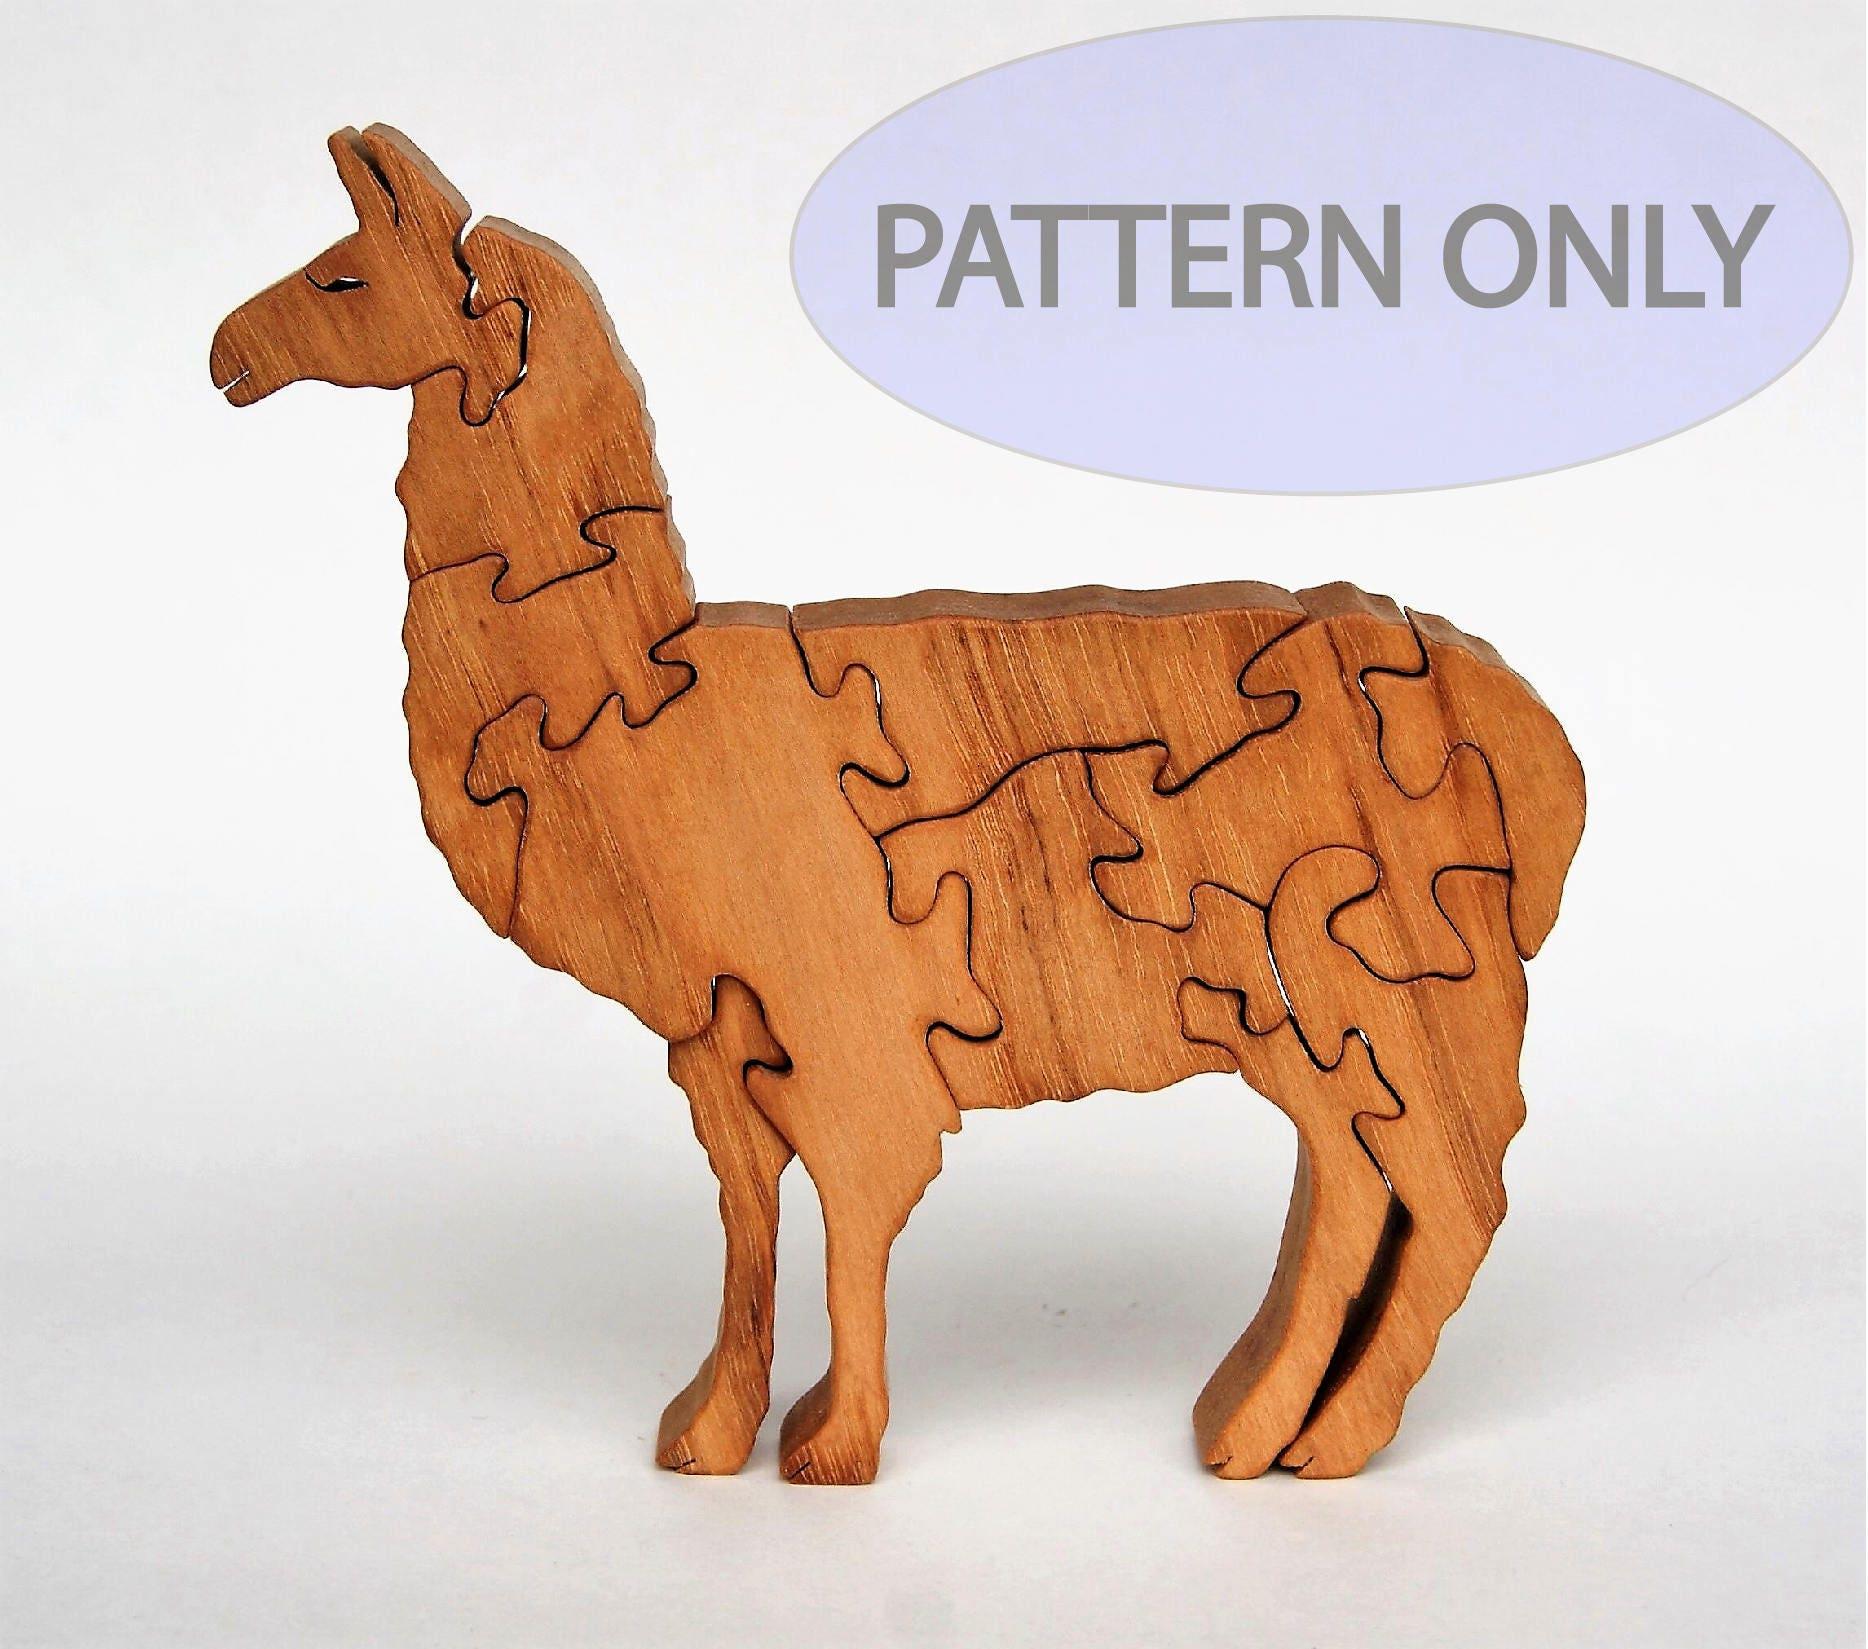 Llama Wooden Puzzle Scrollsaw Pattern PDF Digital Download Woodworking Plan Wood Puzzle Patterns ...